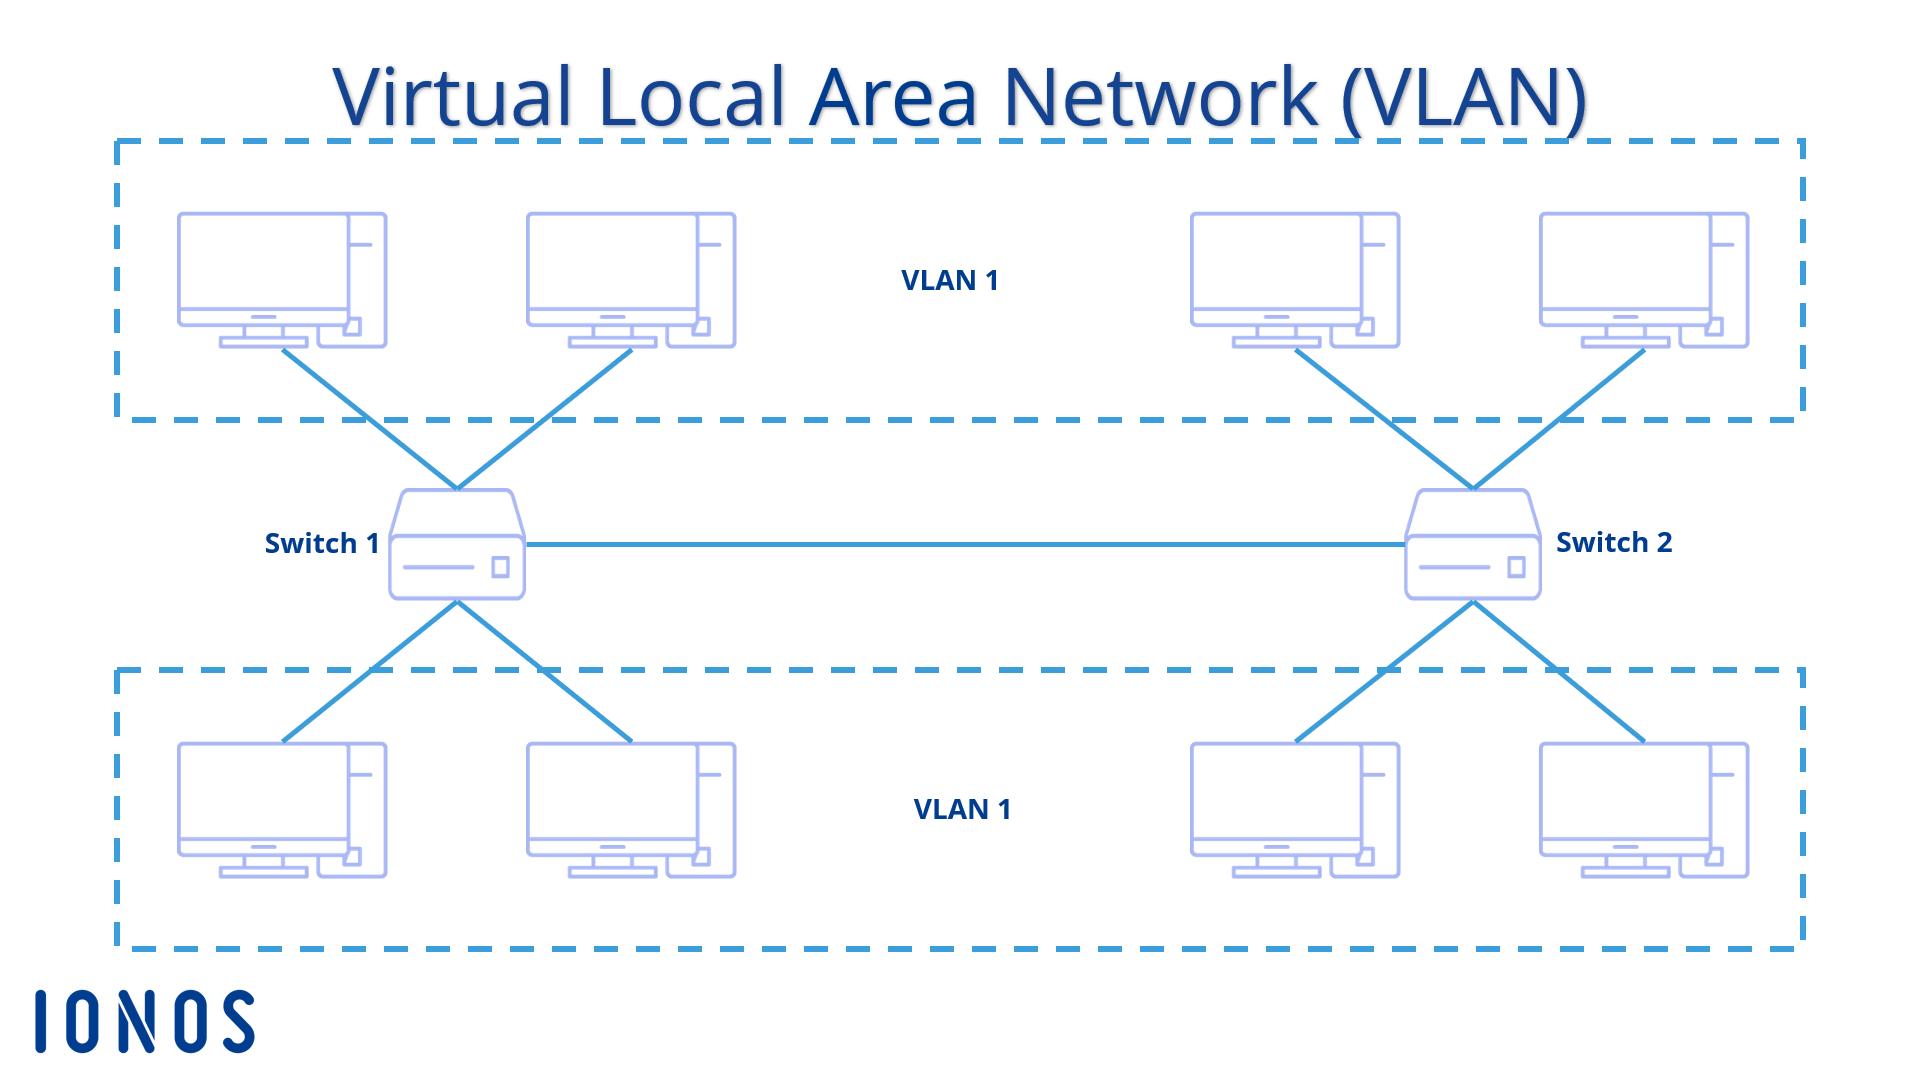 VLAN basics | The technology behind VLAN explained - 1&1 IONOS